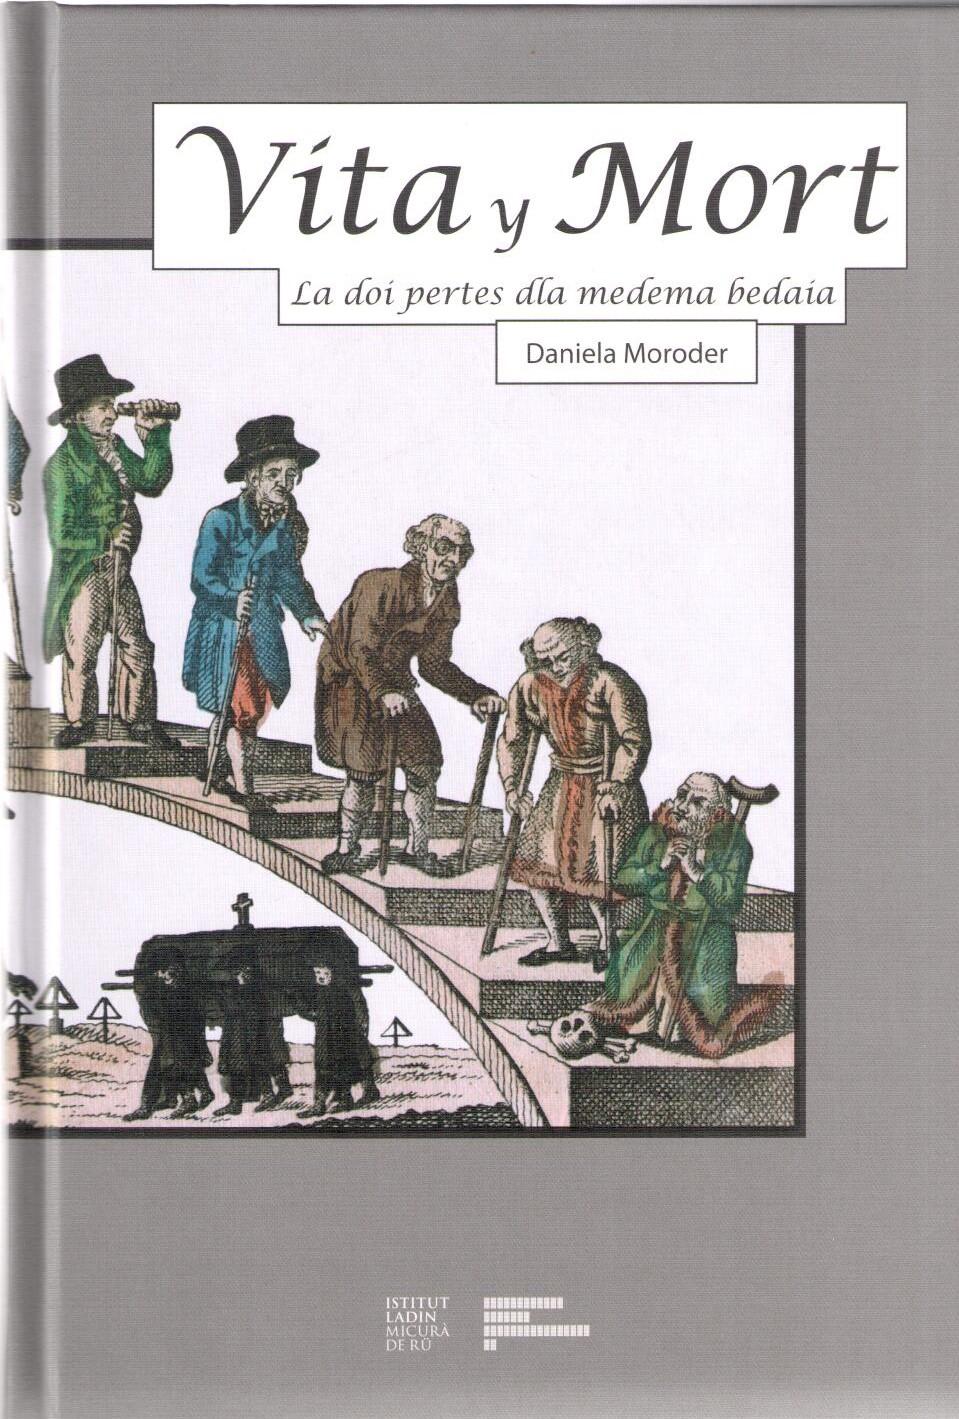 Vita y Mort. La doi pertes dla medema bedaia, Daniela Moroder